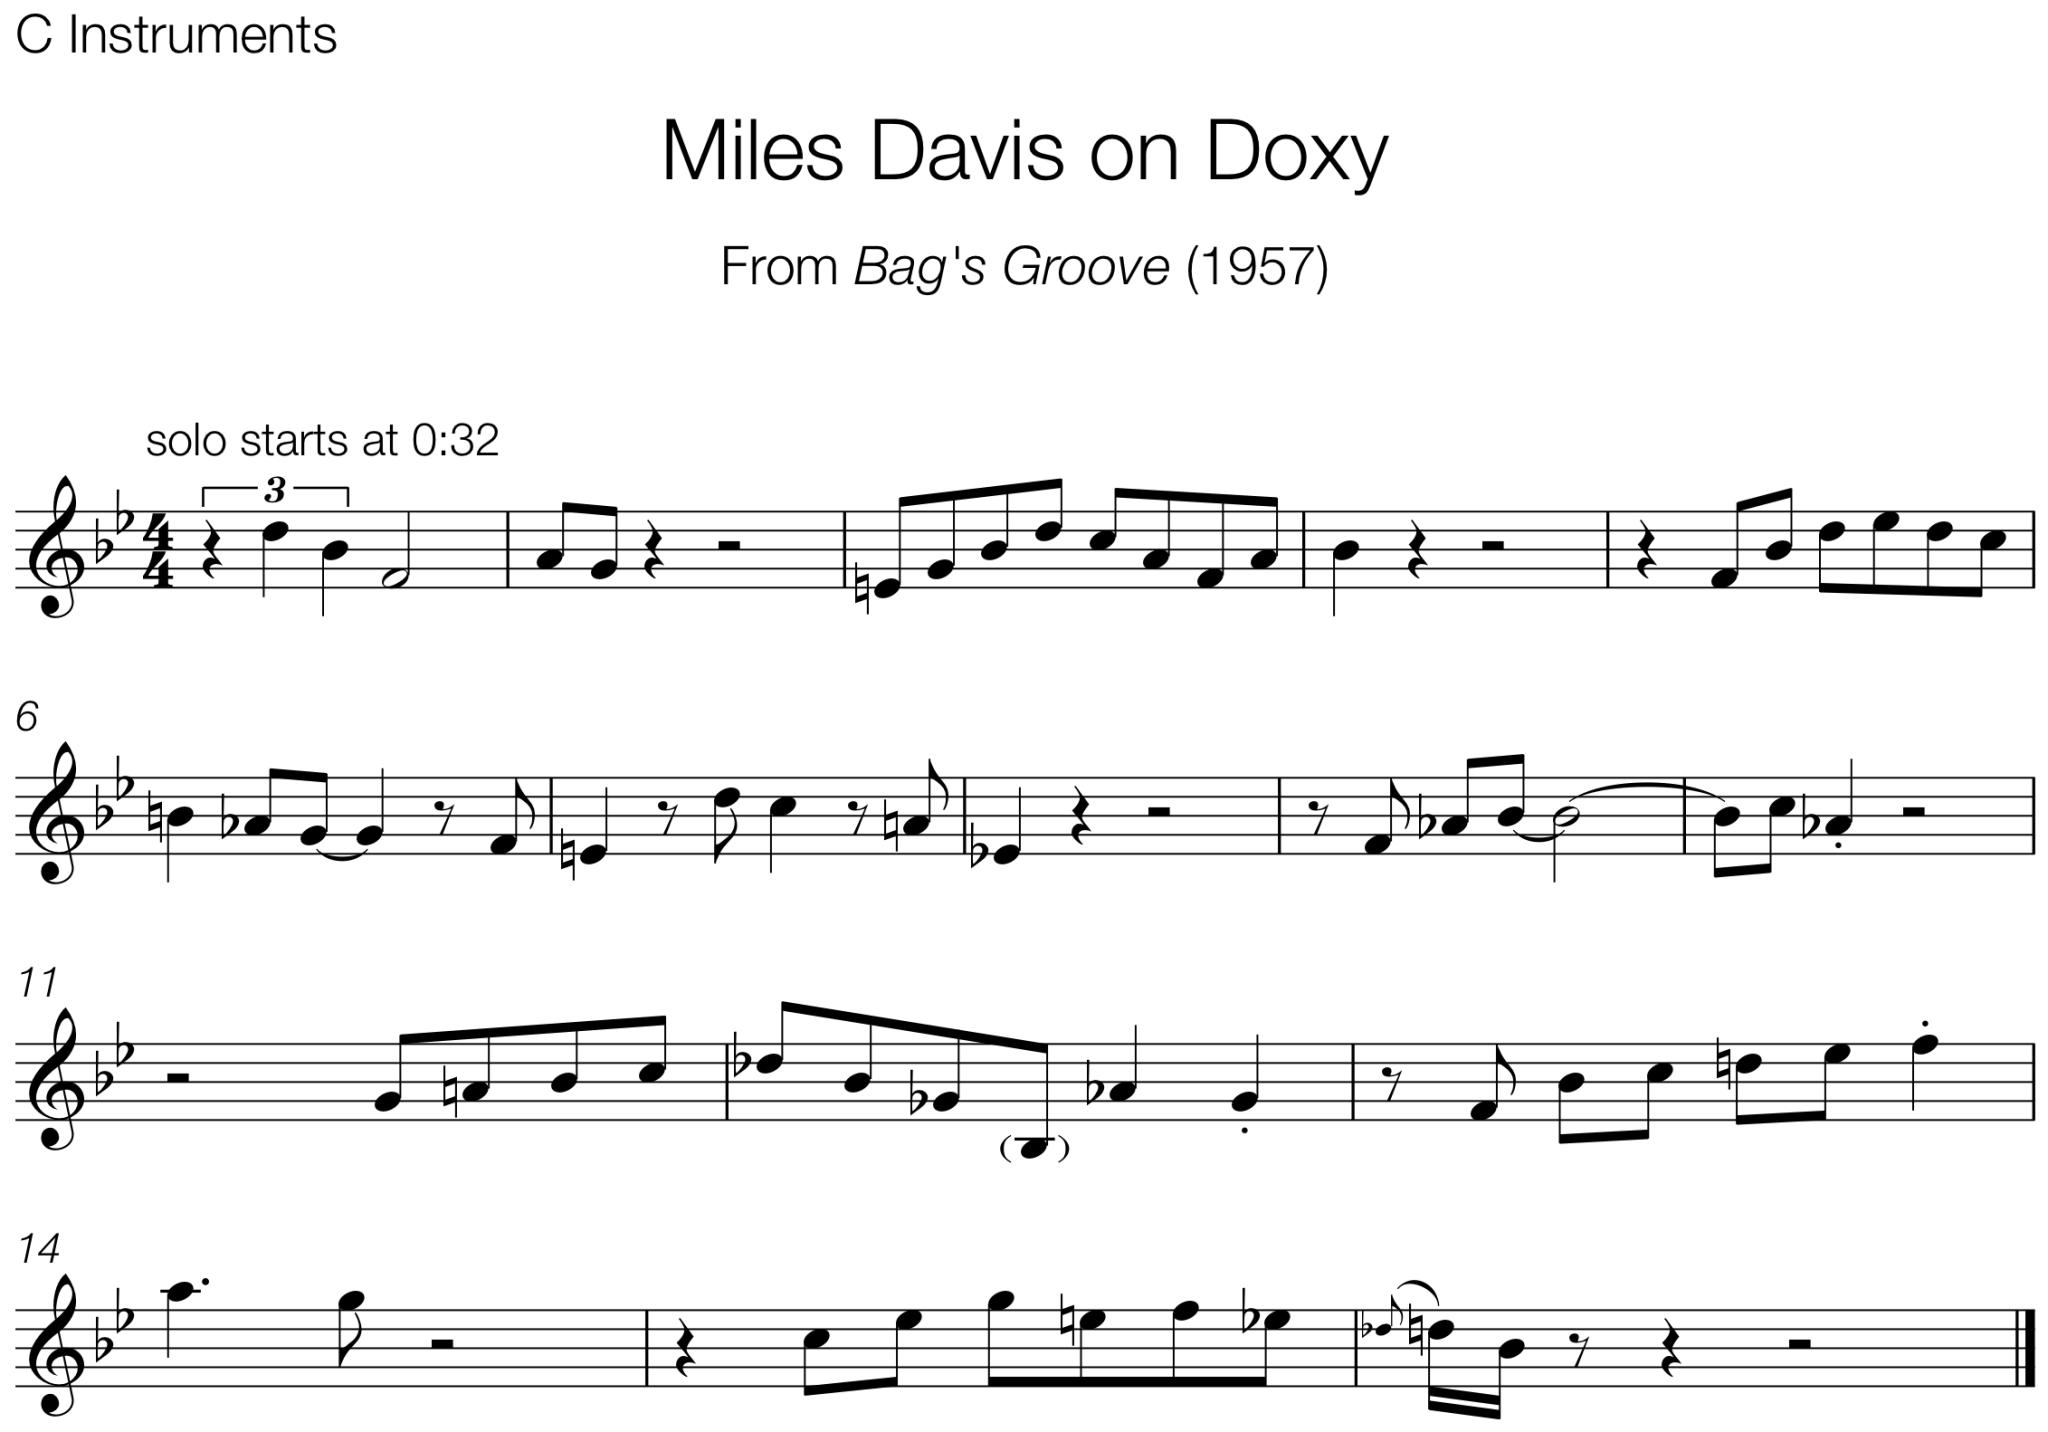 Miles Davis on Doxy – The Jazz Language